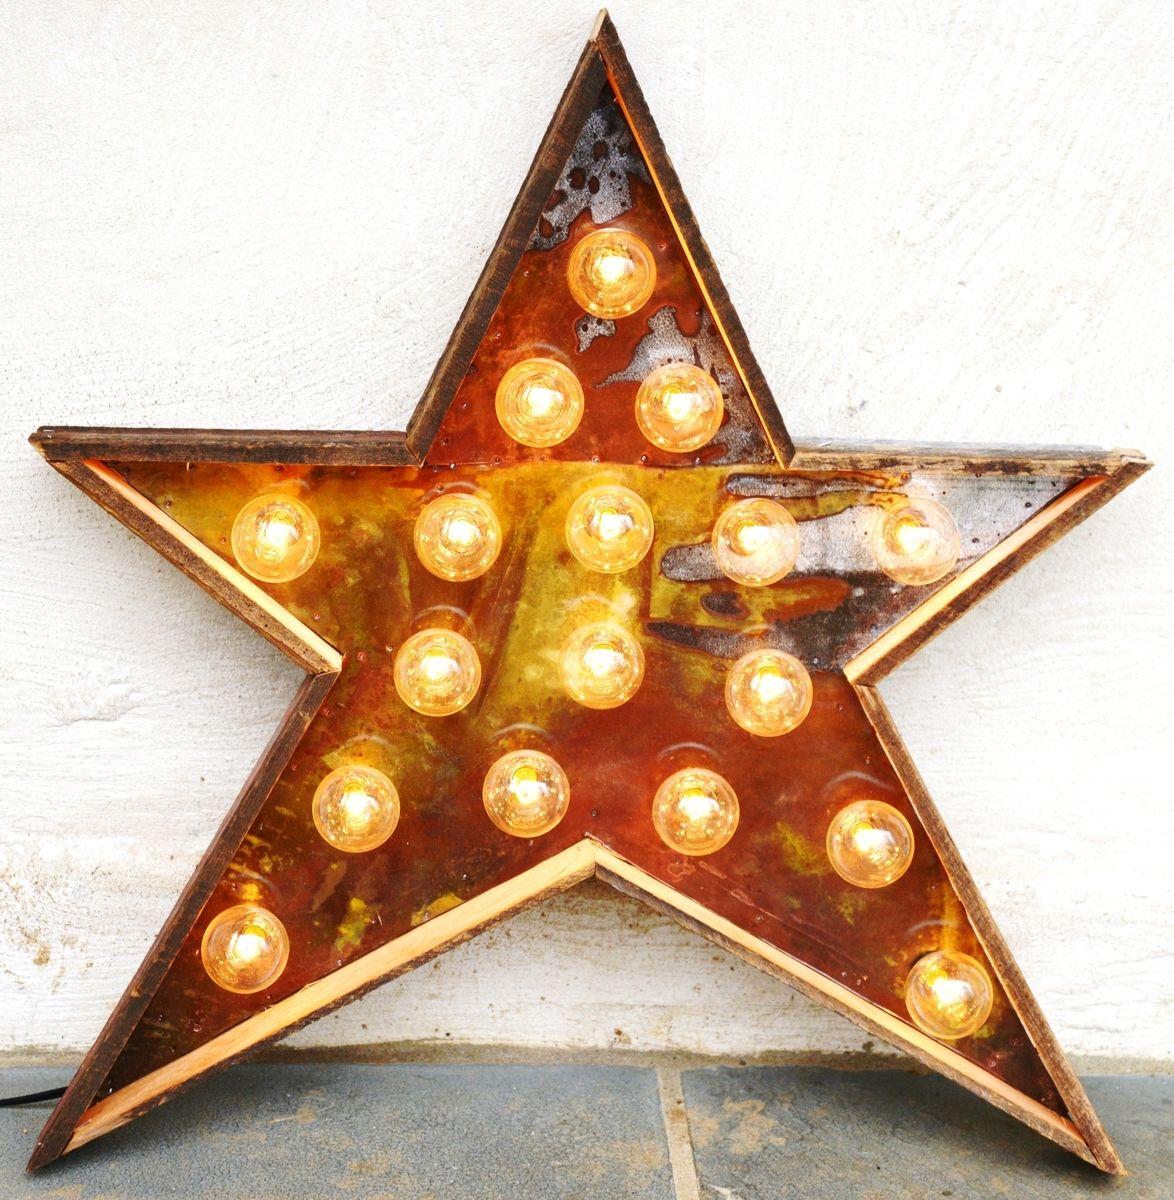 Hand crafted star light fixture metal sign reclaimed barn wood 24 custom made star light fixture metal sign reclaimed barn wood 24 inch diameter arubaitofo Choice Image